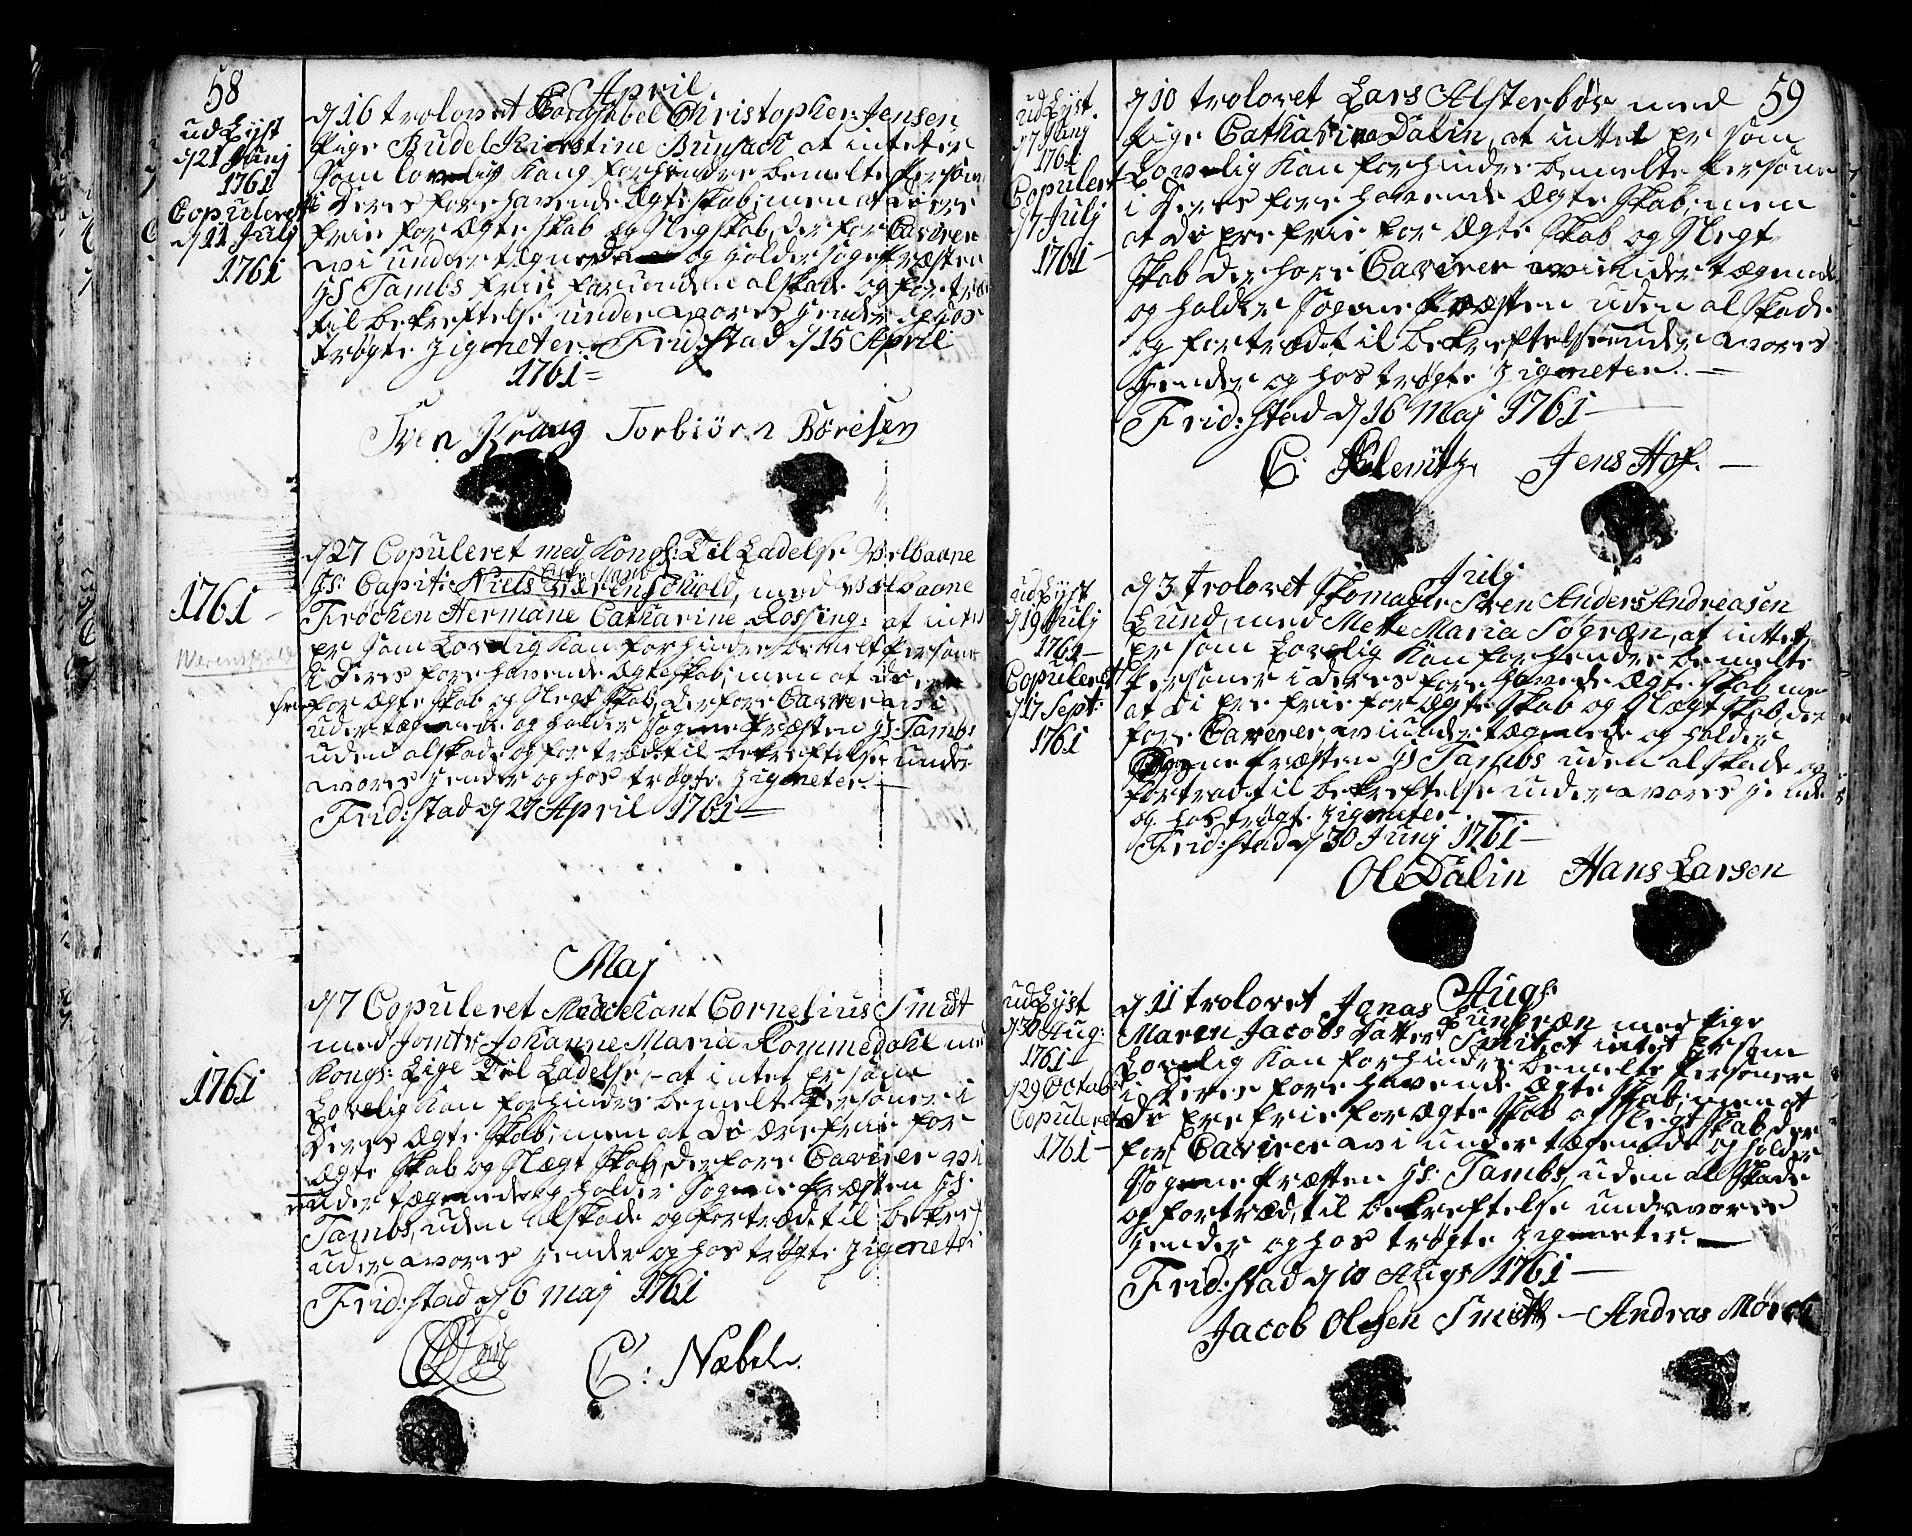 SAO, Fredrikstad prestekontor Kirkebøker, F/Fa/L0002: Ministerialbok nr. 2, 1750-1804, s. 58-59